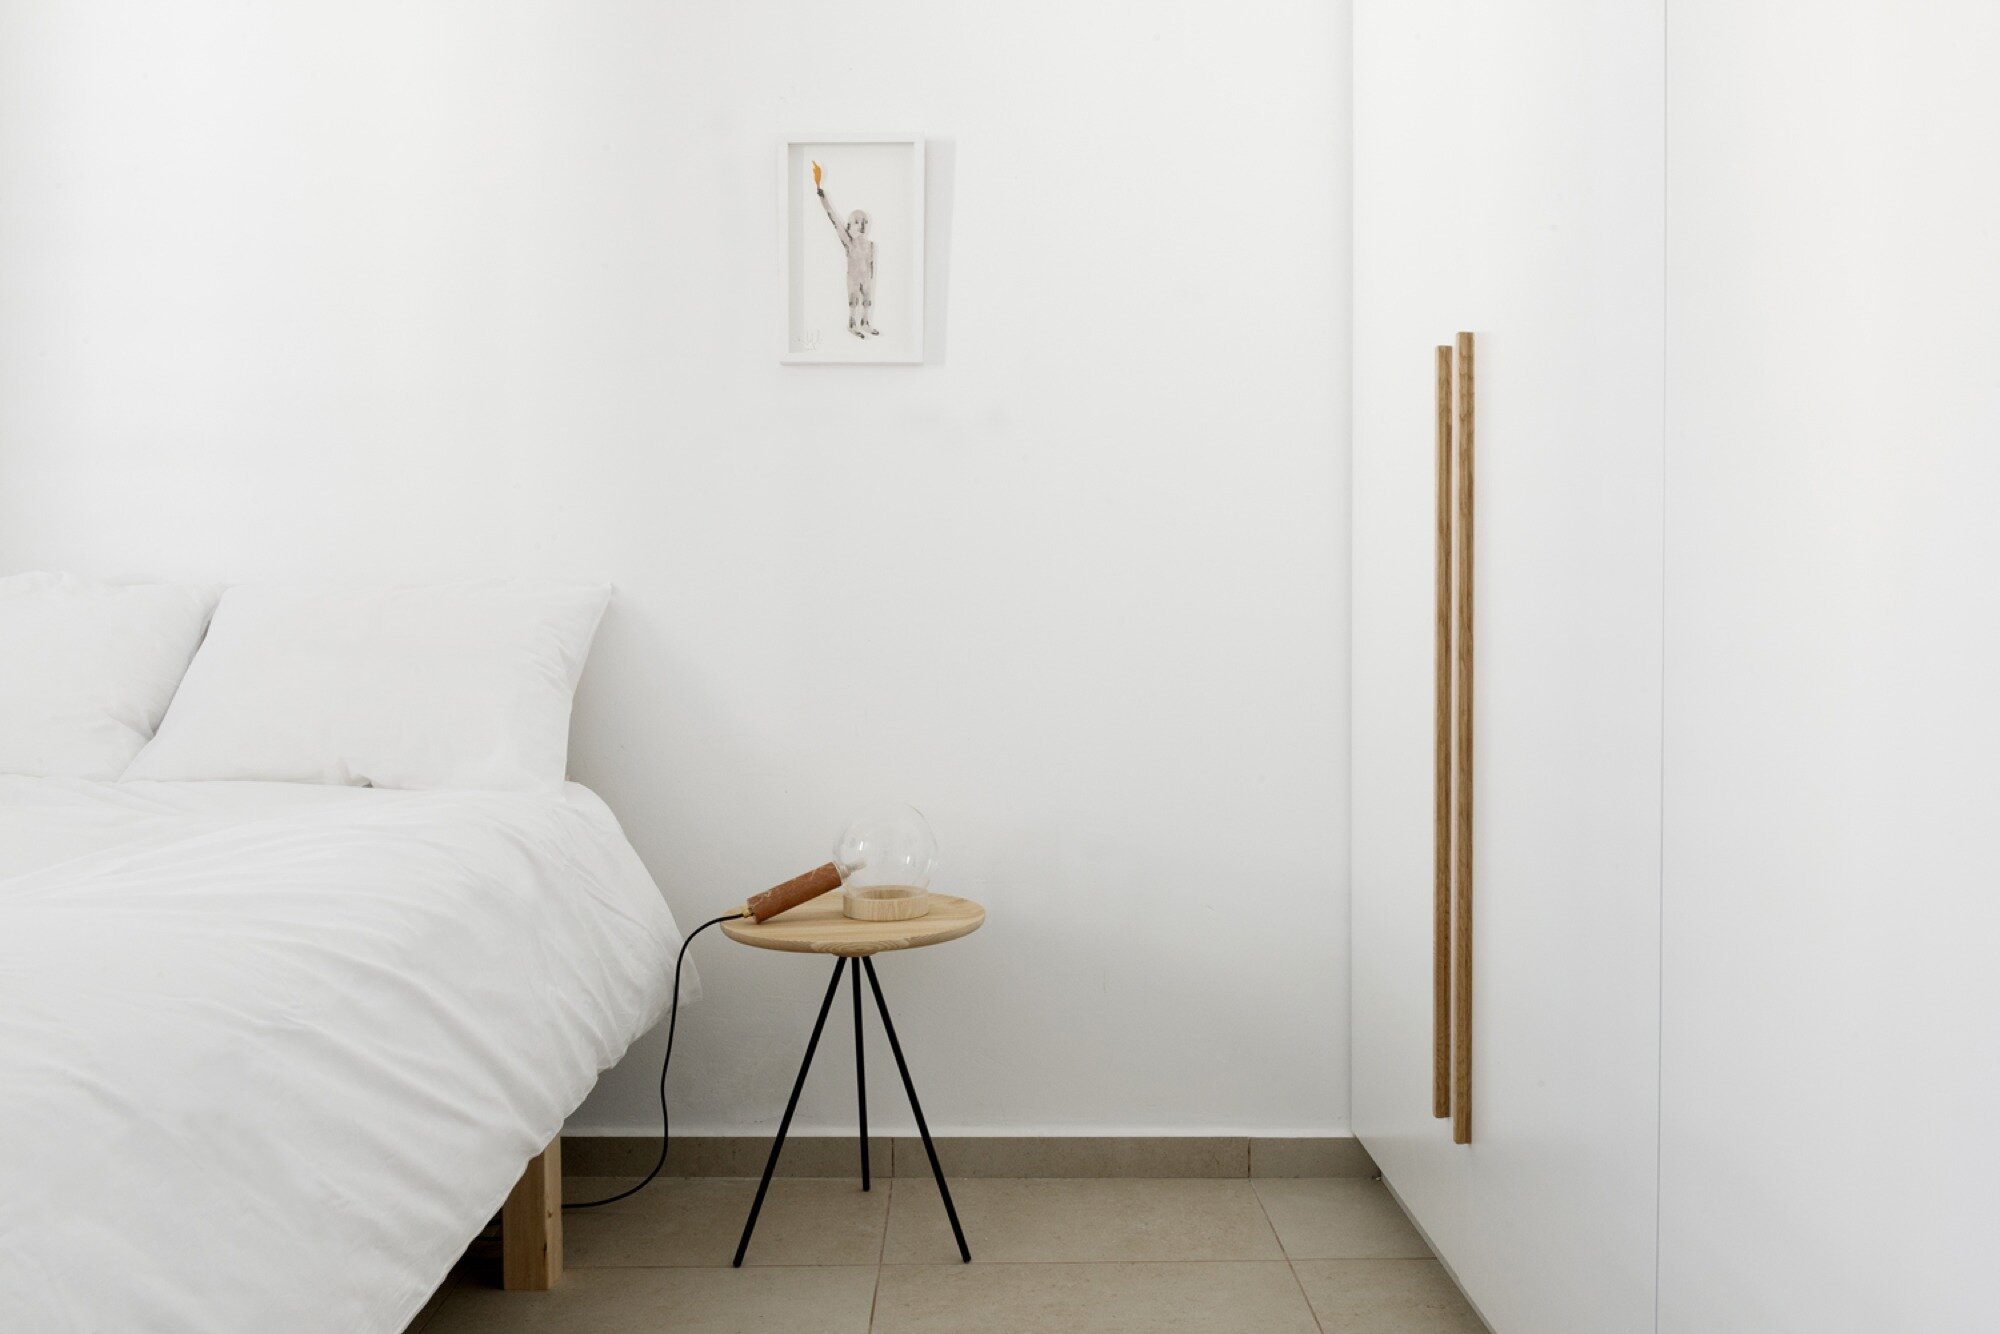 Apartment in Ramat Gan - Itai Palti - Israel - Bedroom - Humble Homes